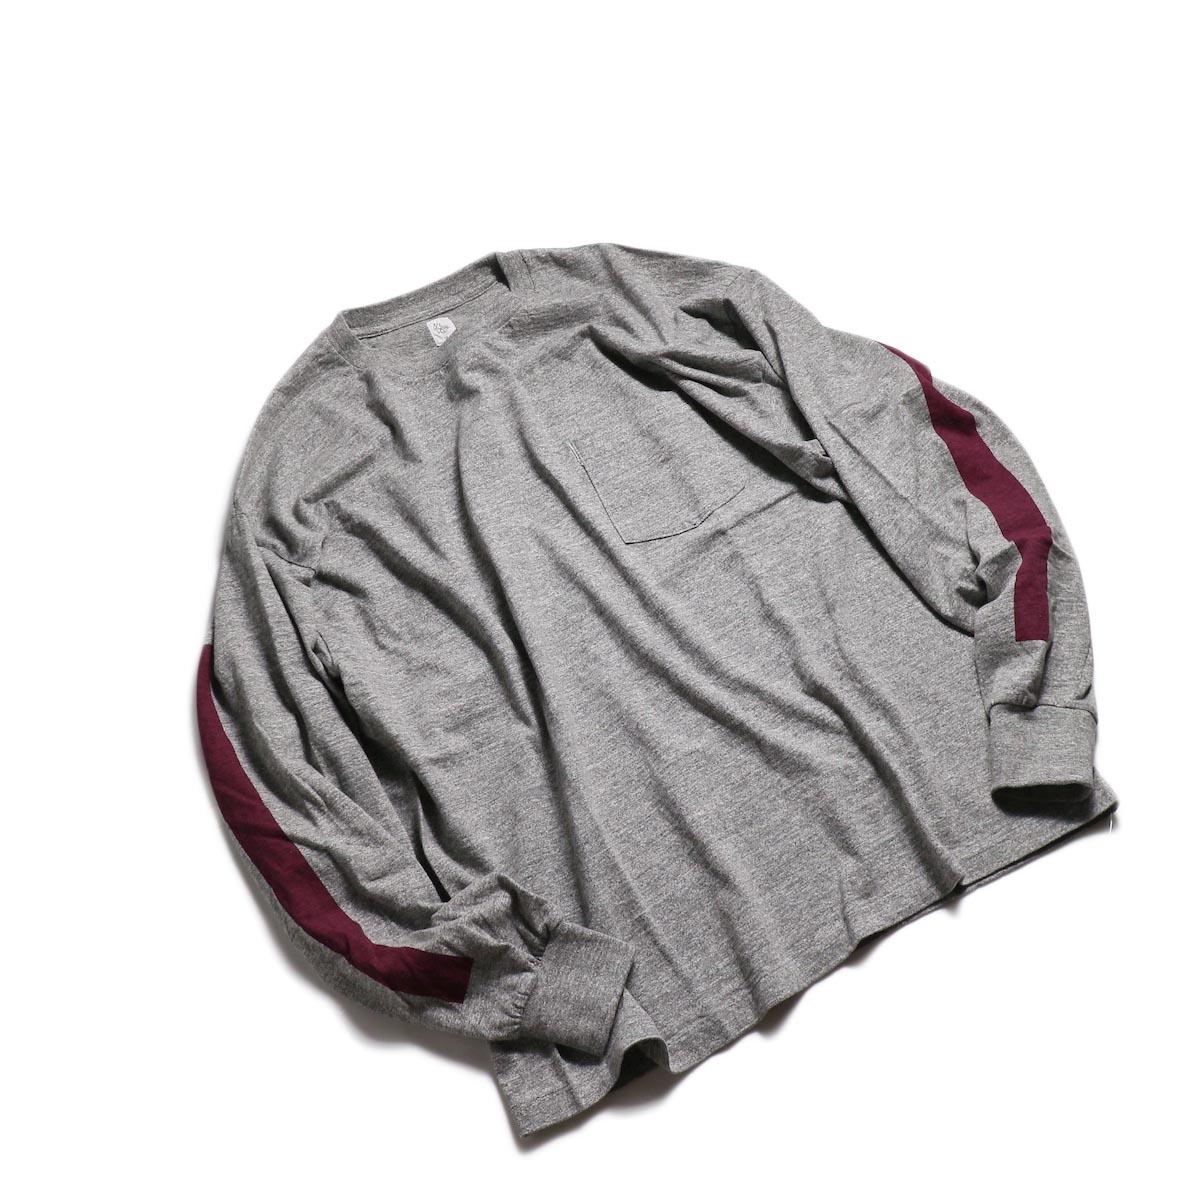 Kaptain Sunshine / West Coast L/S Tee -Feather Grey × Burgundy Line 全体